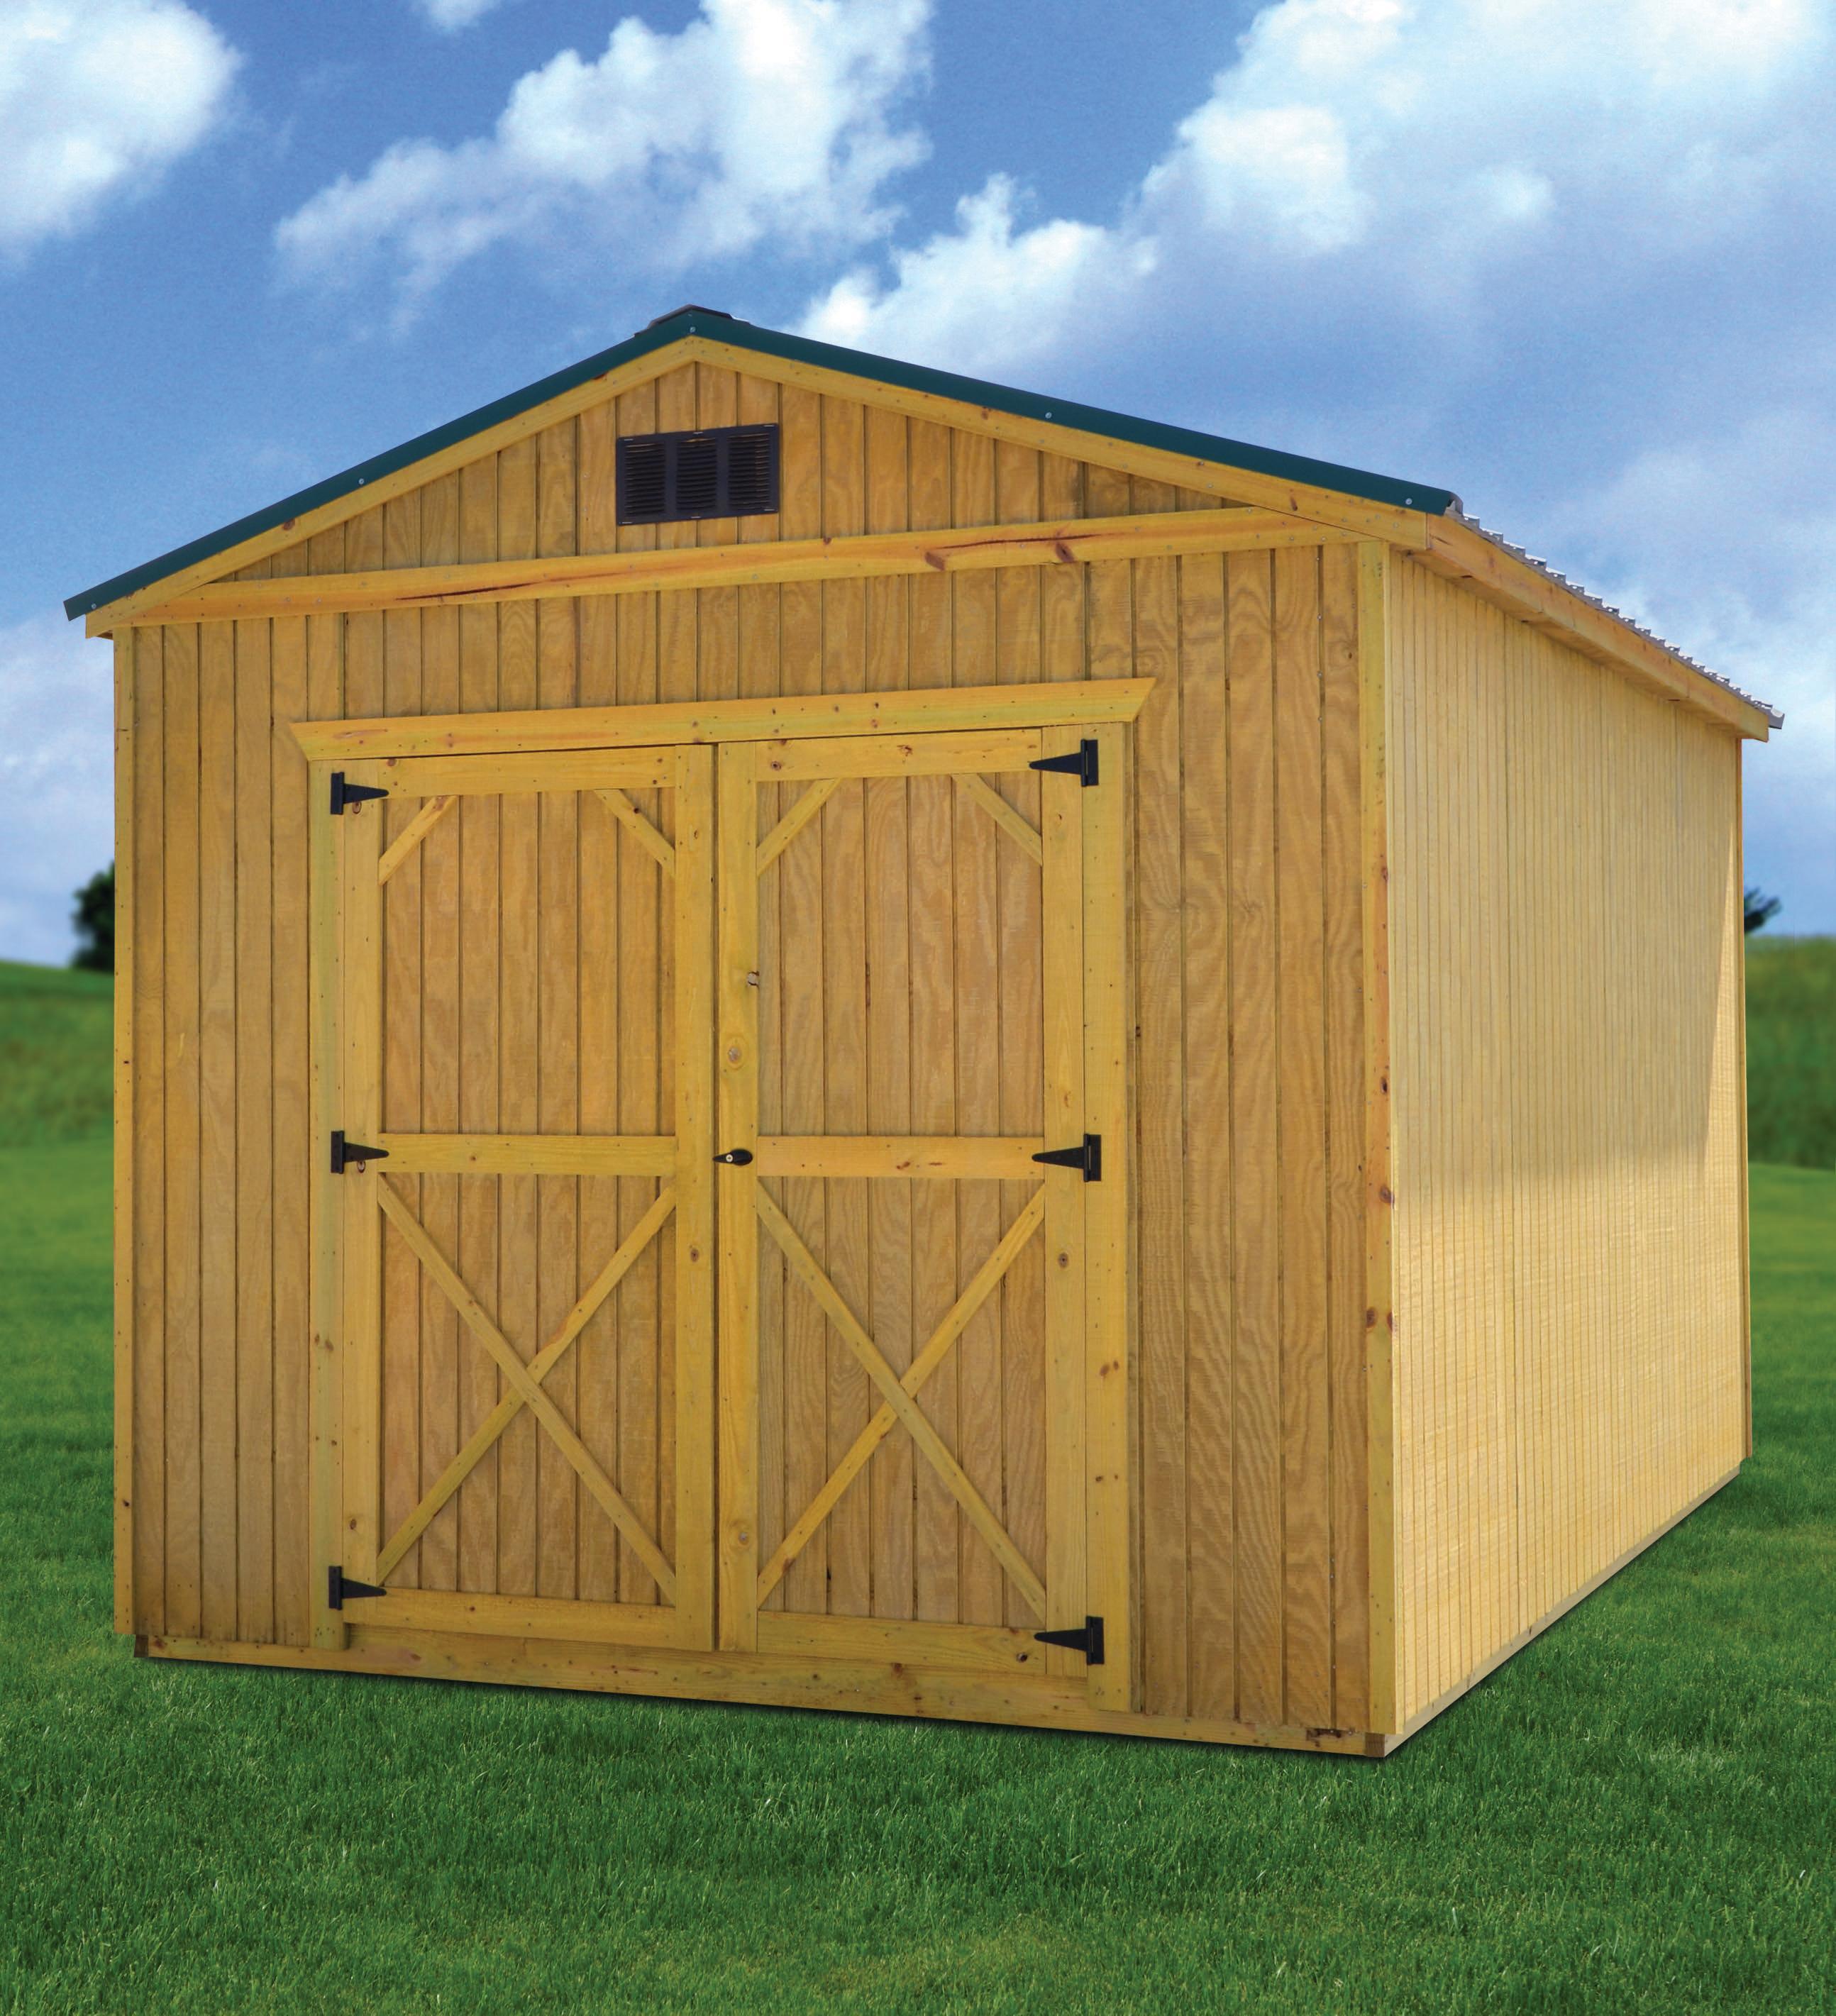 Carport Vallery: Wade Yoder Storage Buildings Etc In Fort Valley, GA